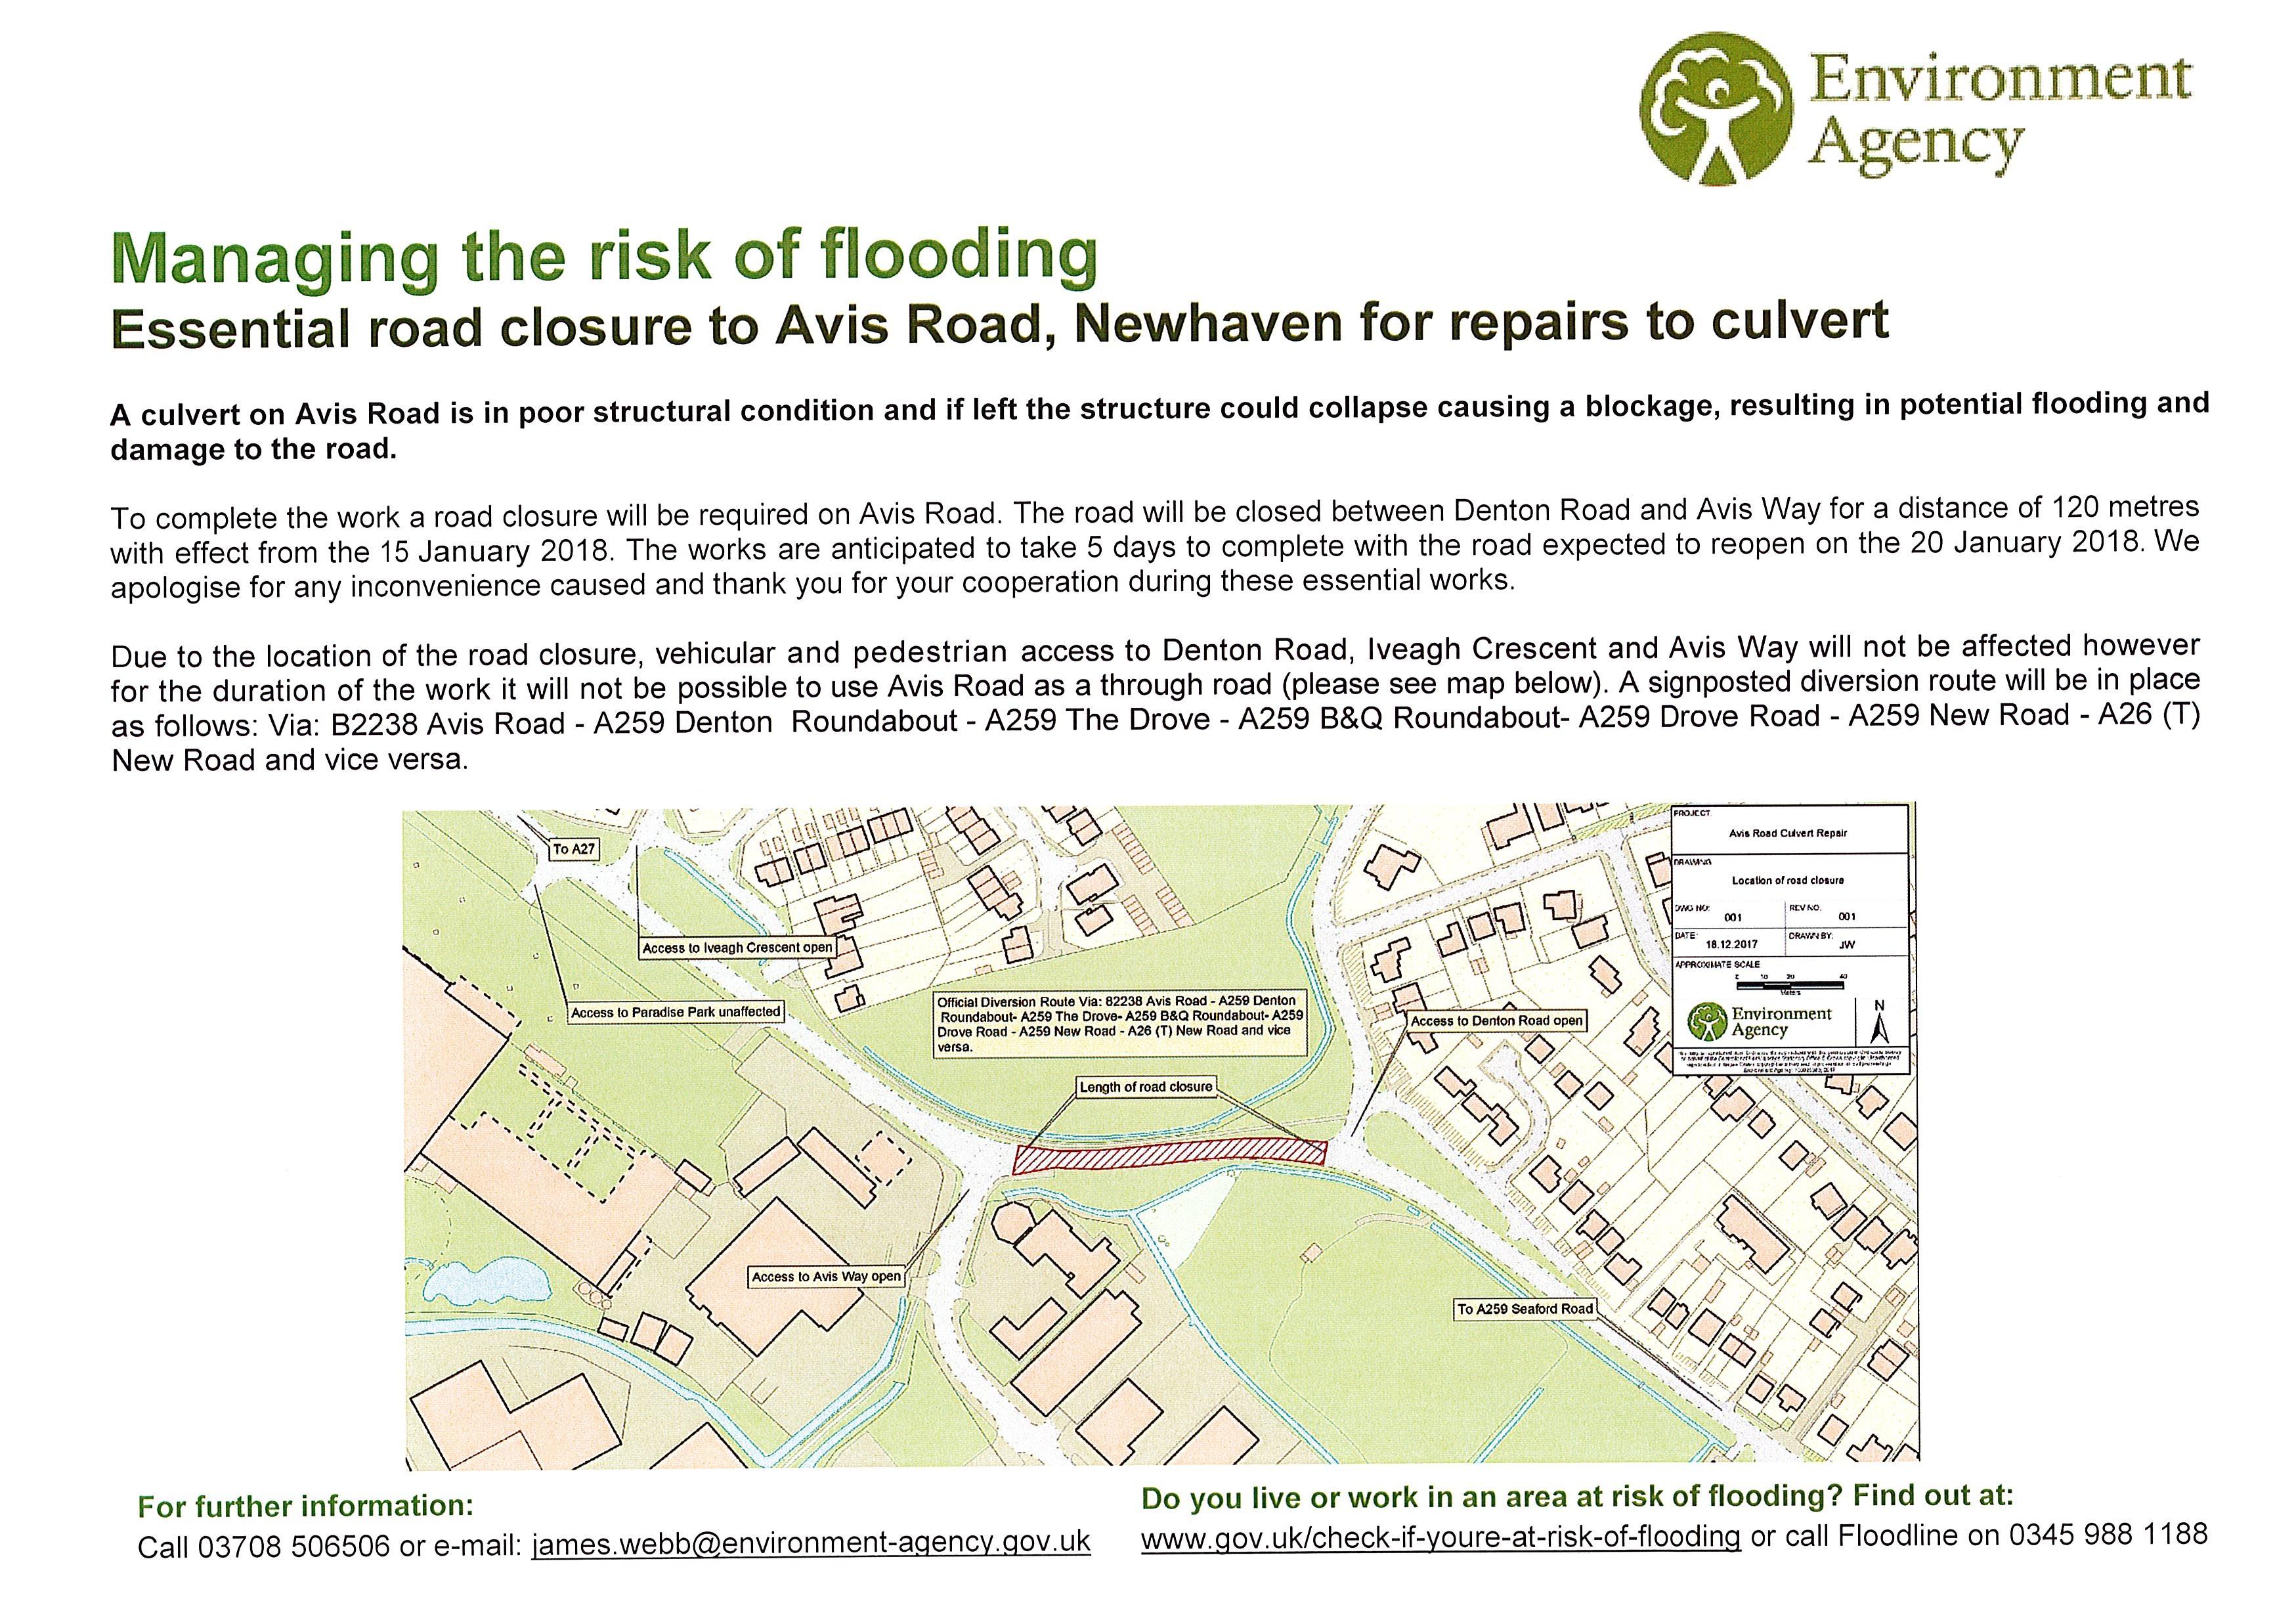 Avis Road Closure - Newhaven Town Council